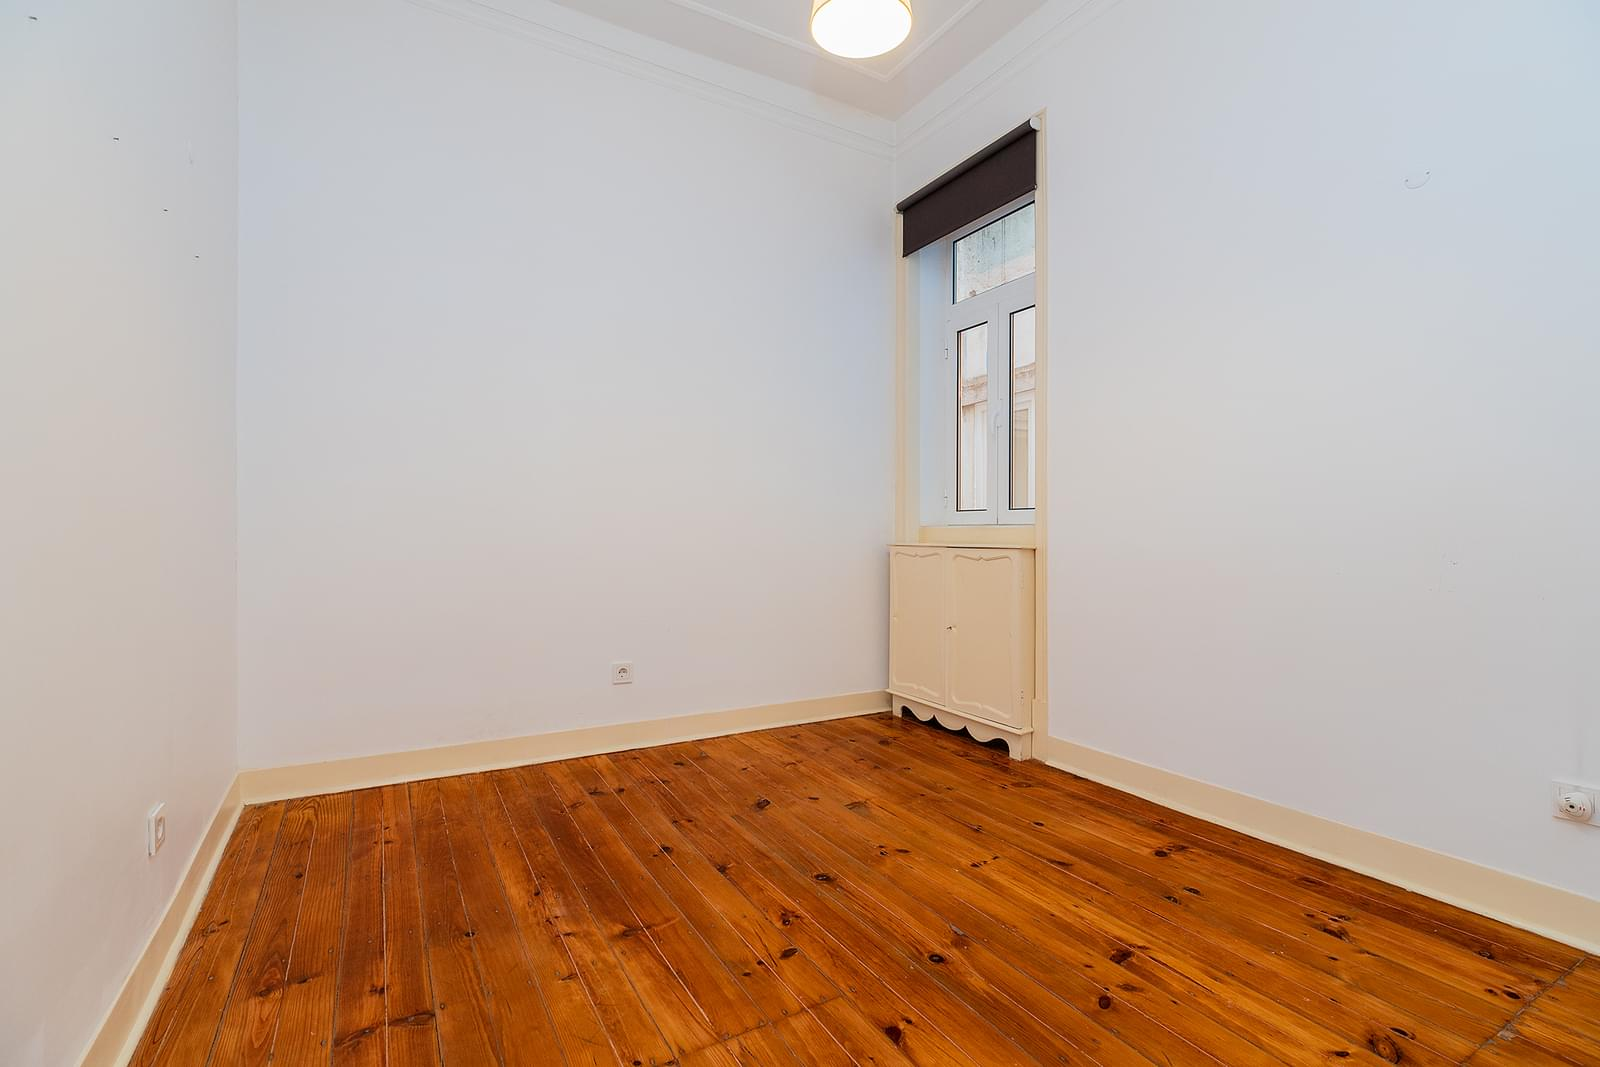 pf18723-apartamento-t3-1-lisboa-9e50ea3f-bb75-4c40-9eef-3e68a0fda5c2